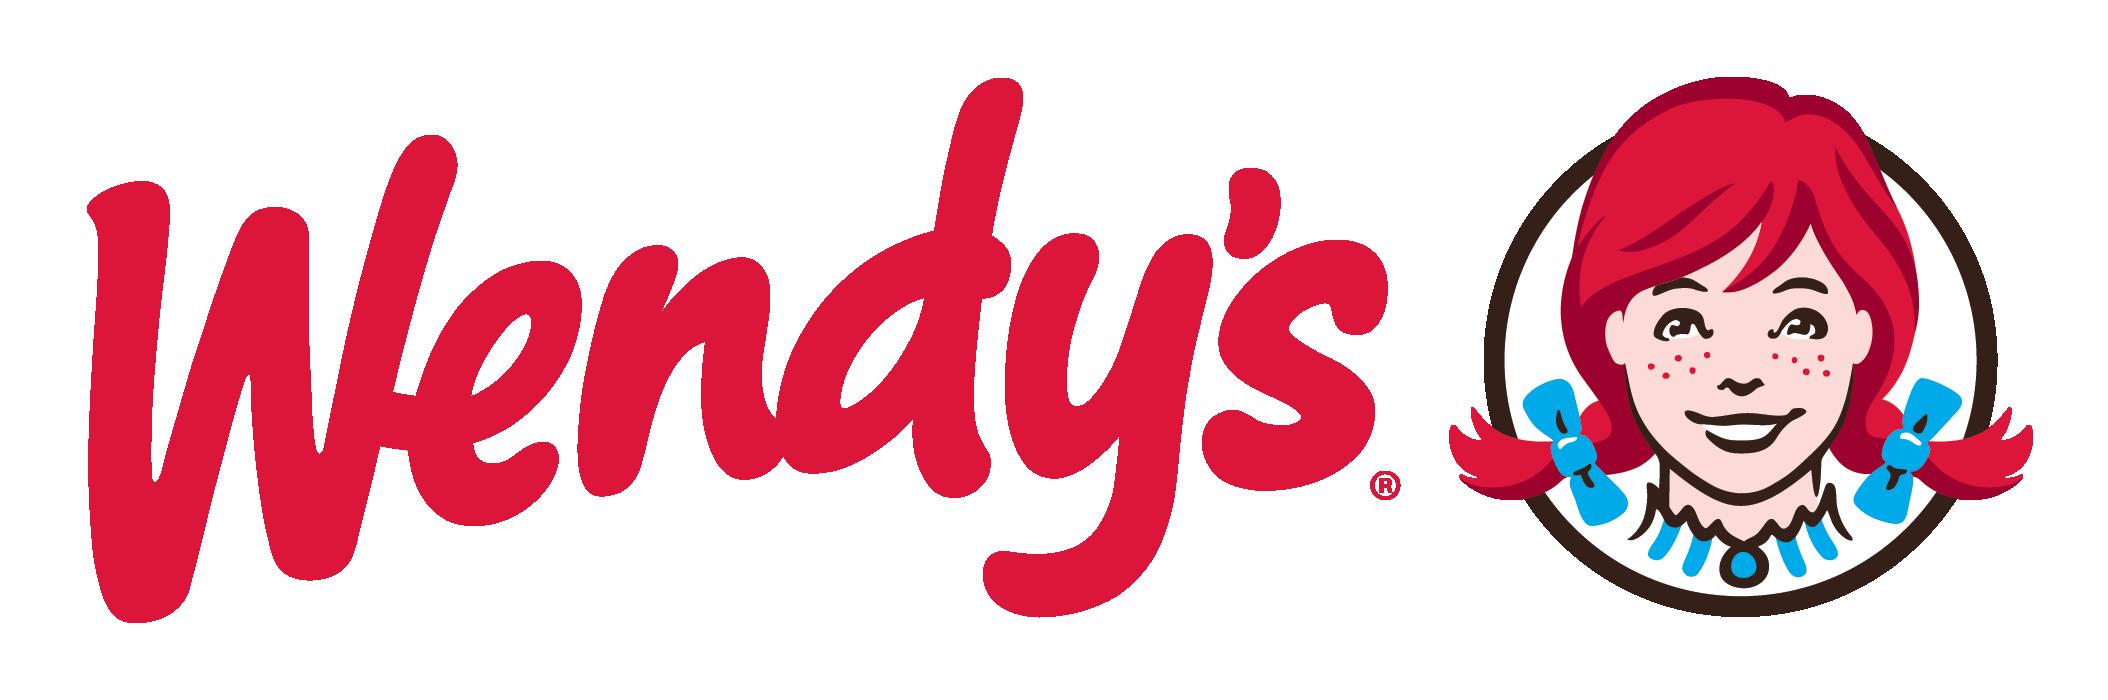 History On Wendy S Restaurant